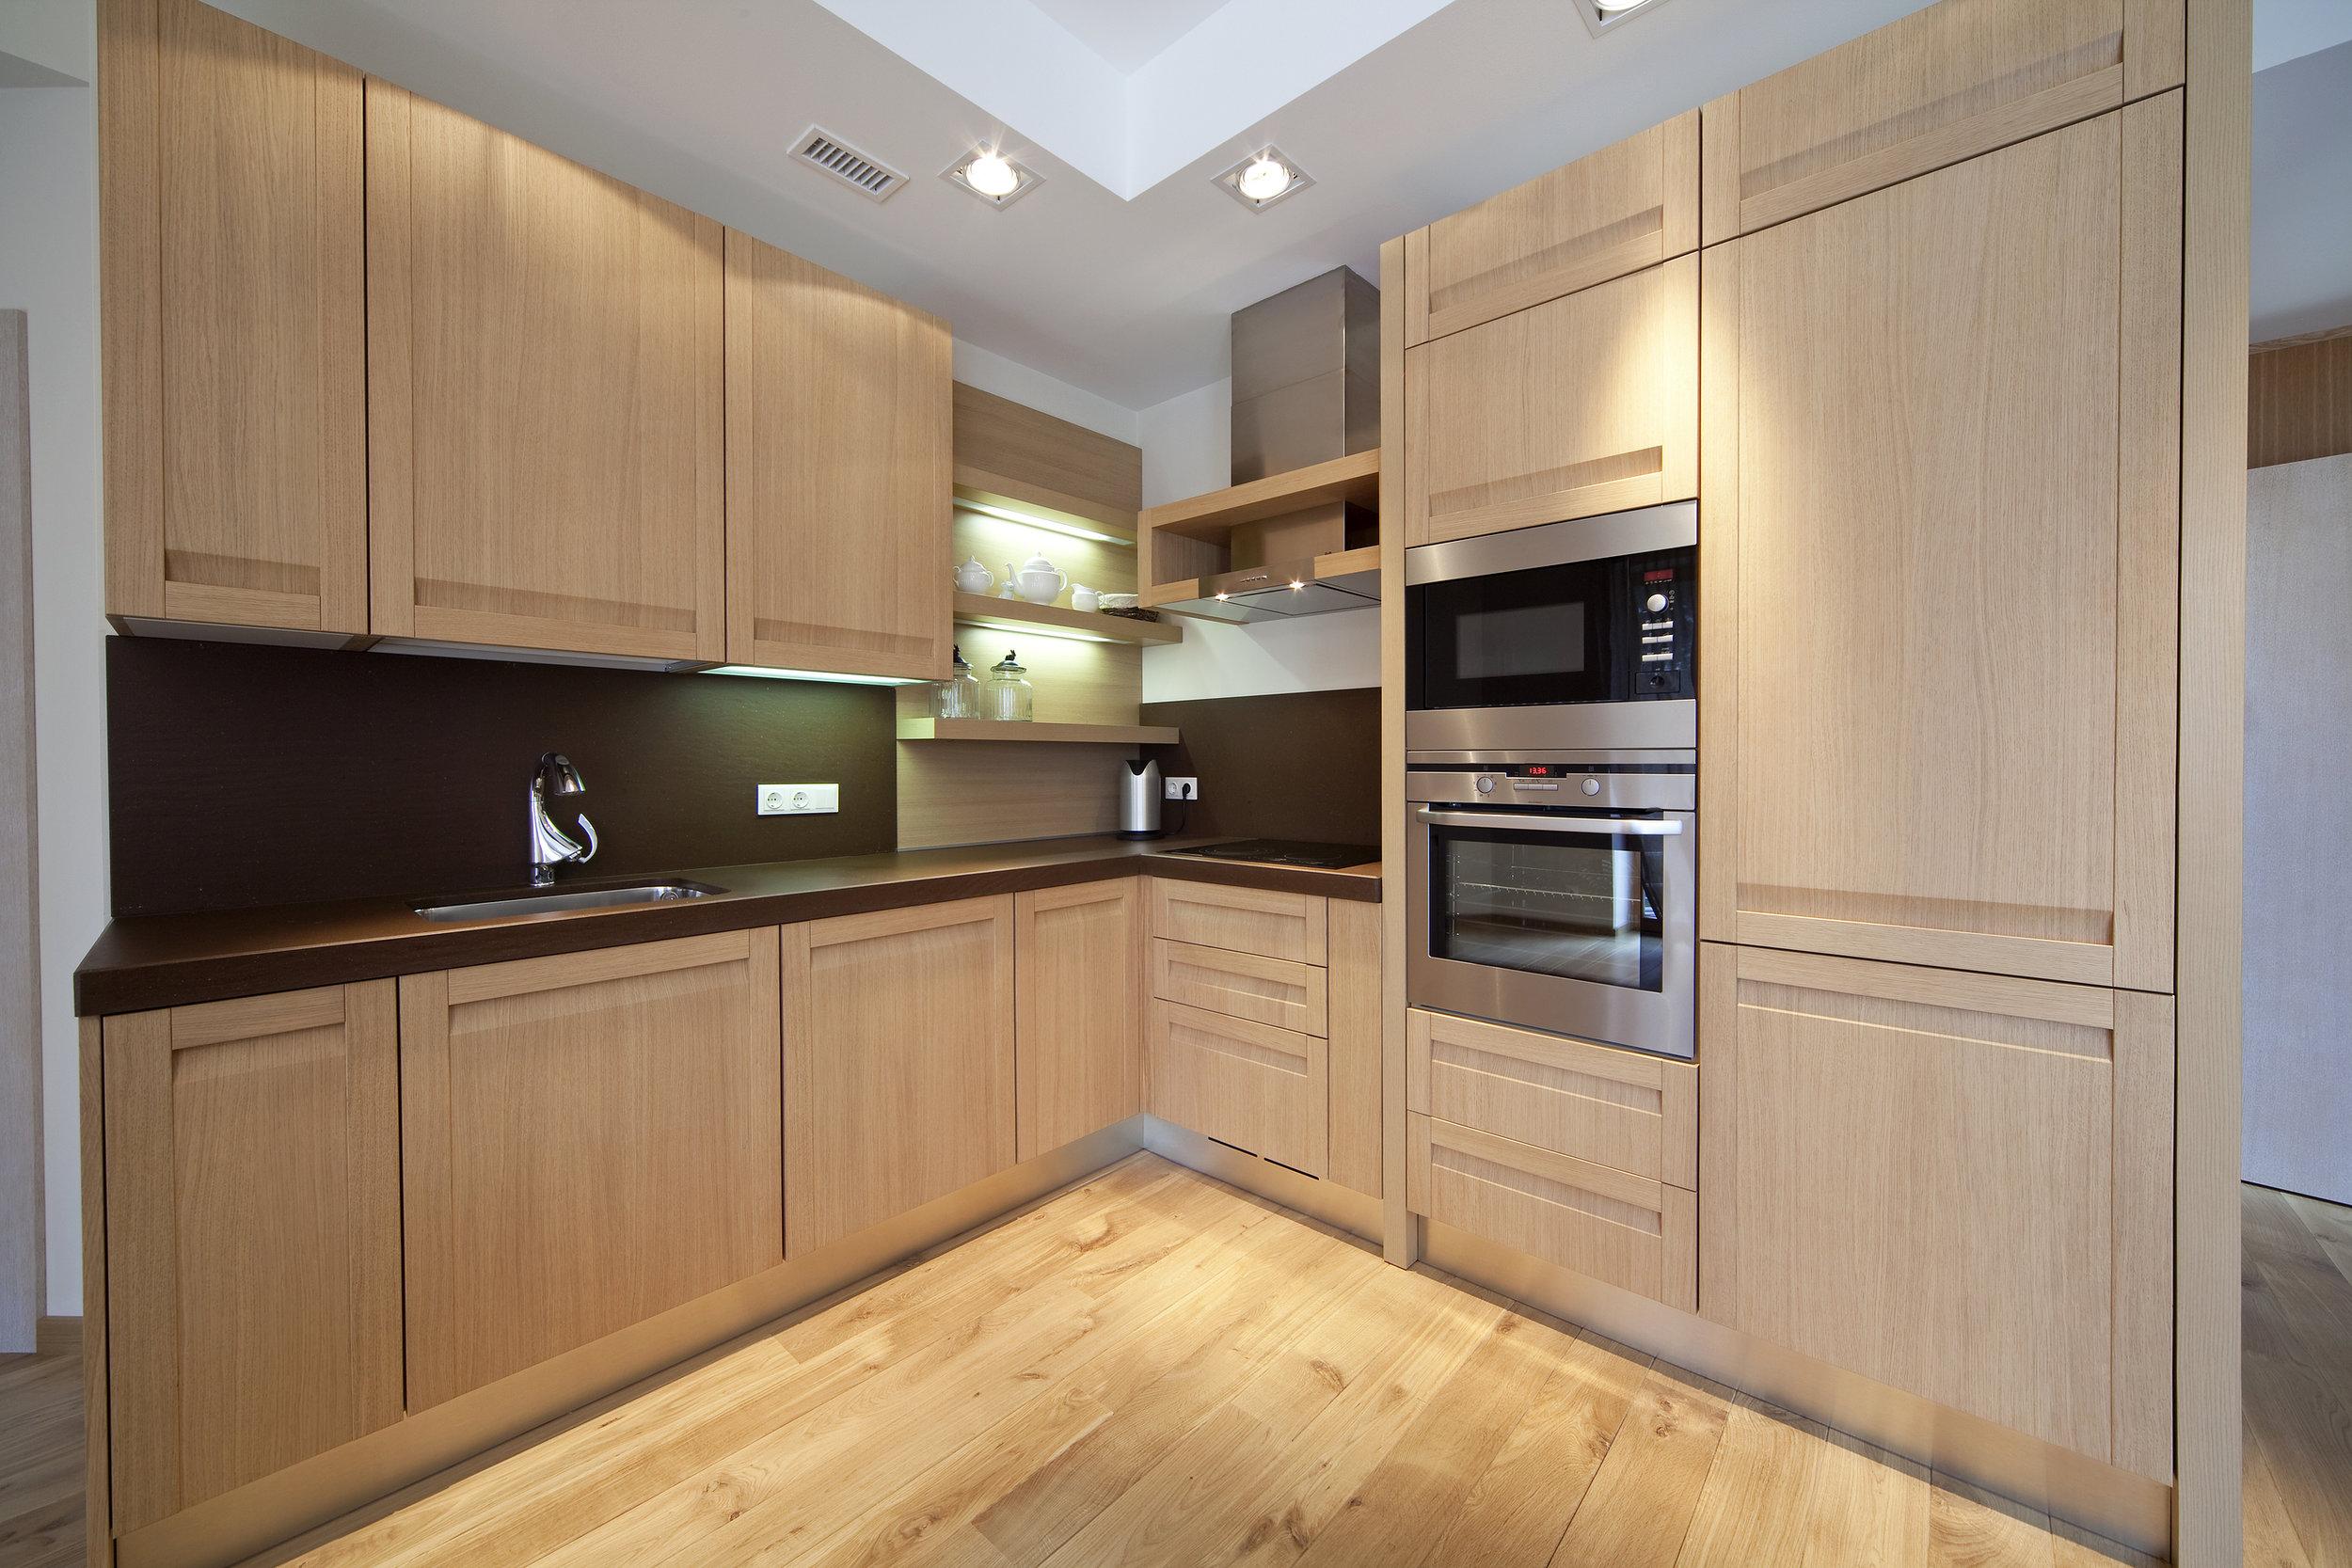 bigstock-Kitchen-5531546.jpg